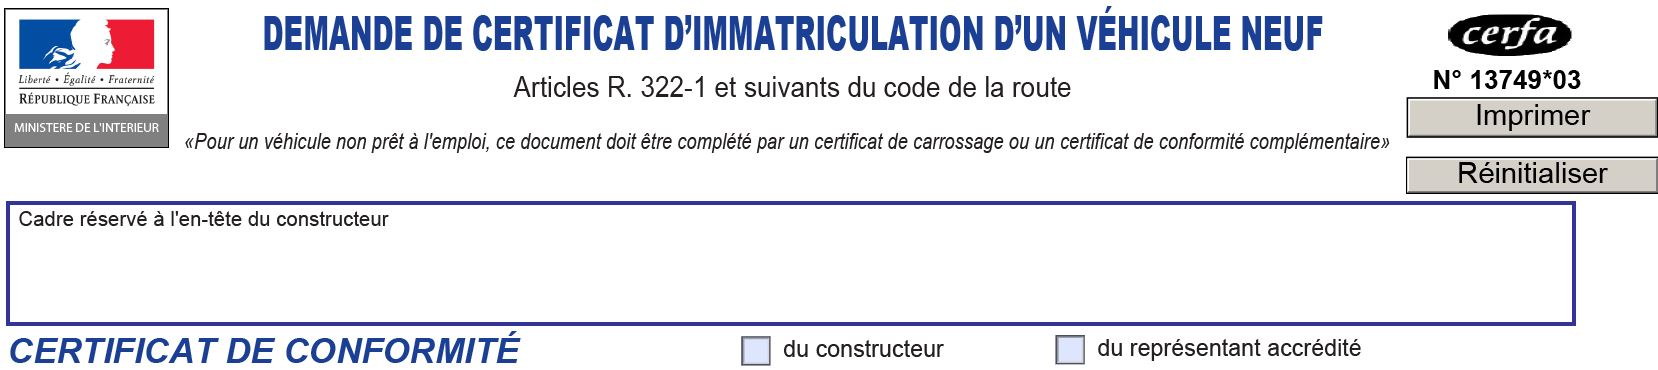 Certificat D Immatriculation Quels Couts Et Pieces Justificatives